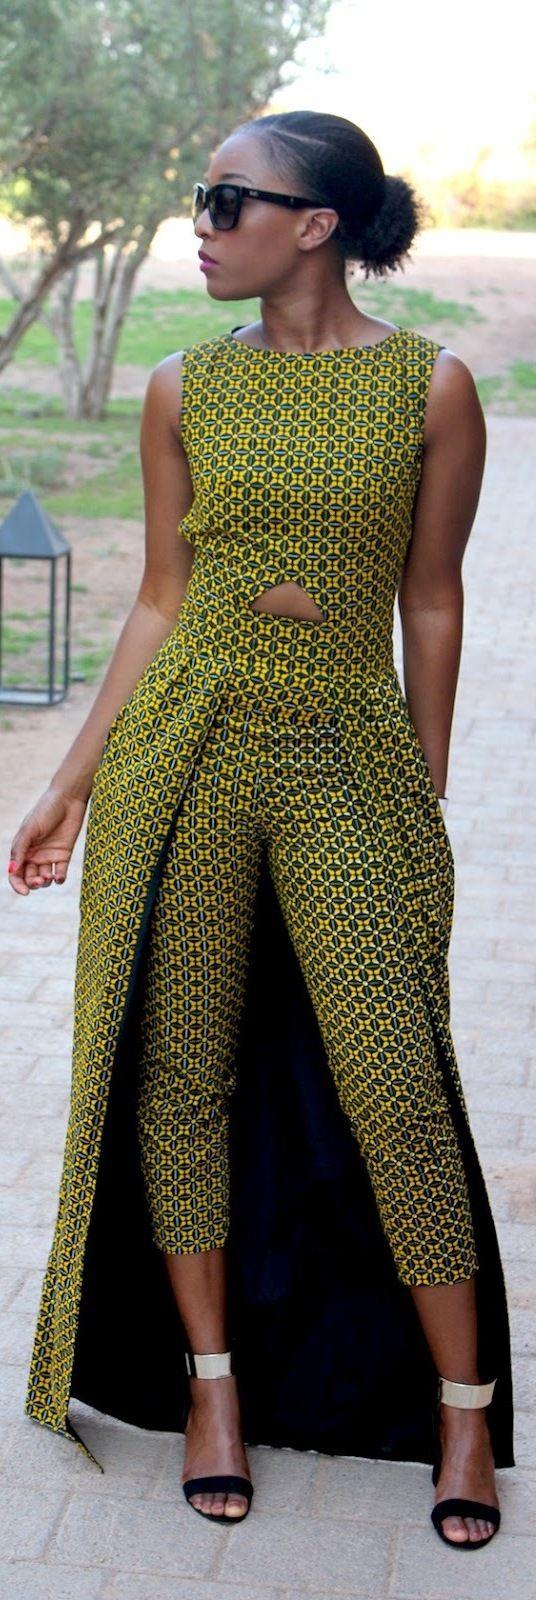 17 bästa idéer om African Outfits på Pinterest | Afrikanskt mode ...